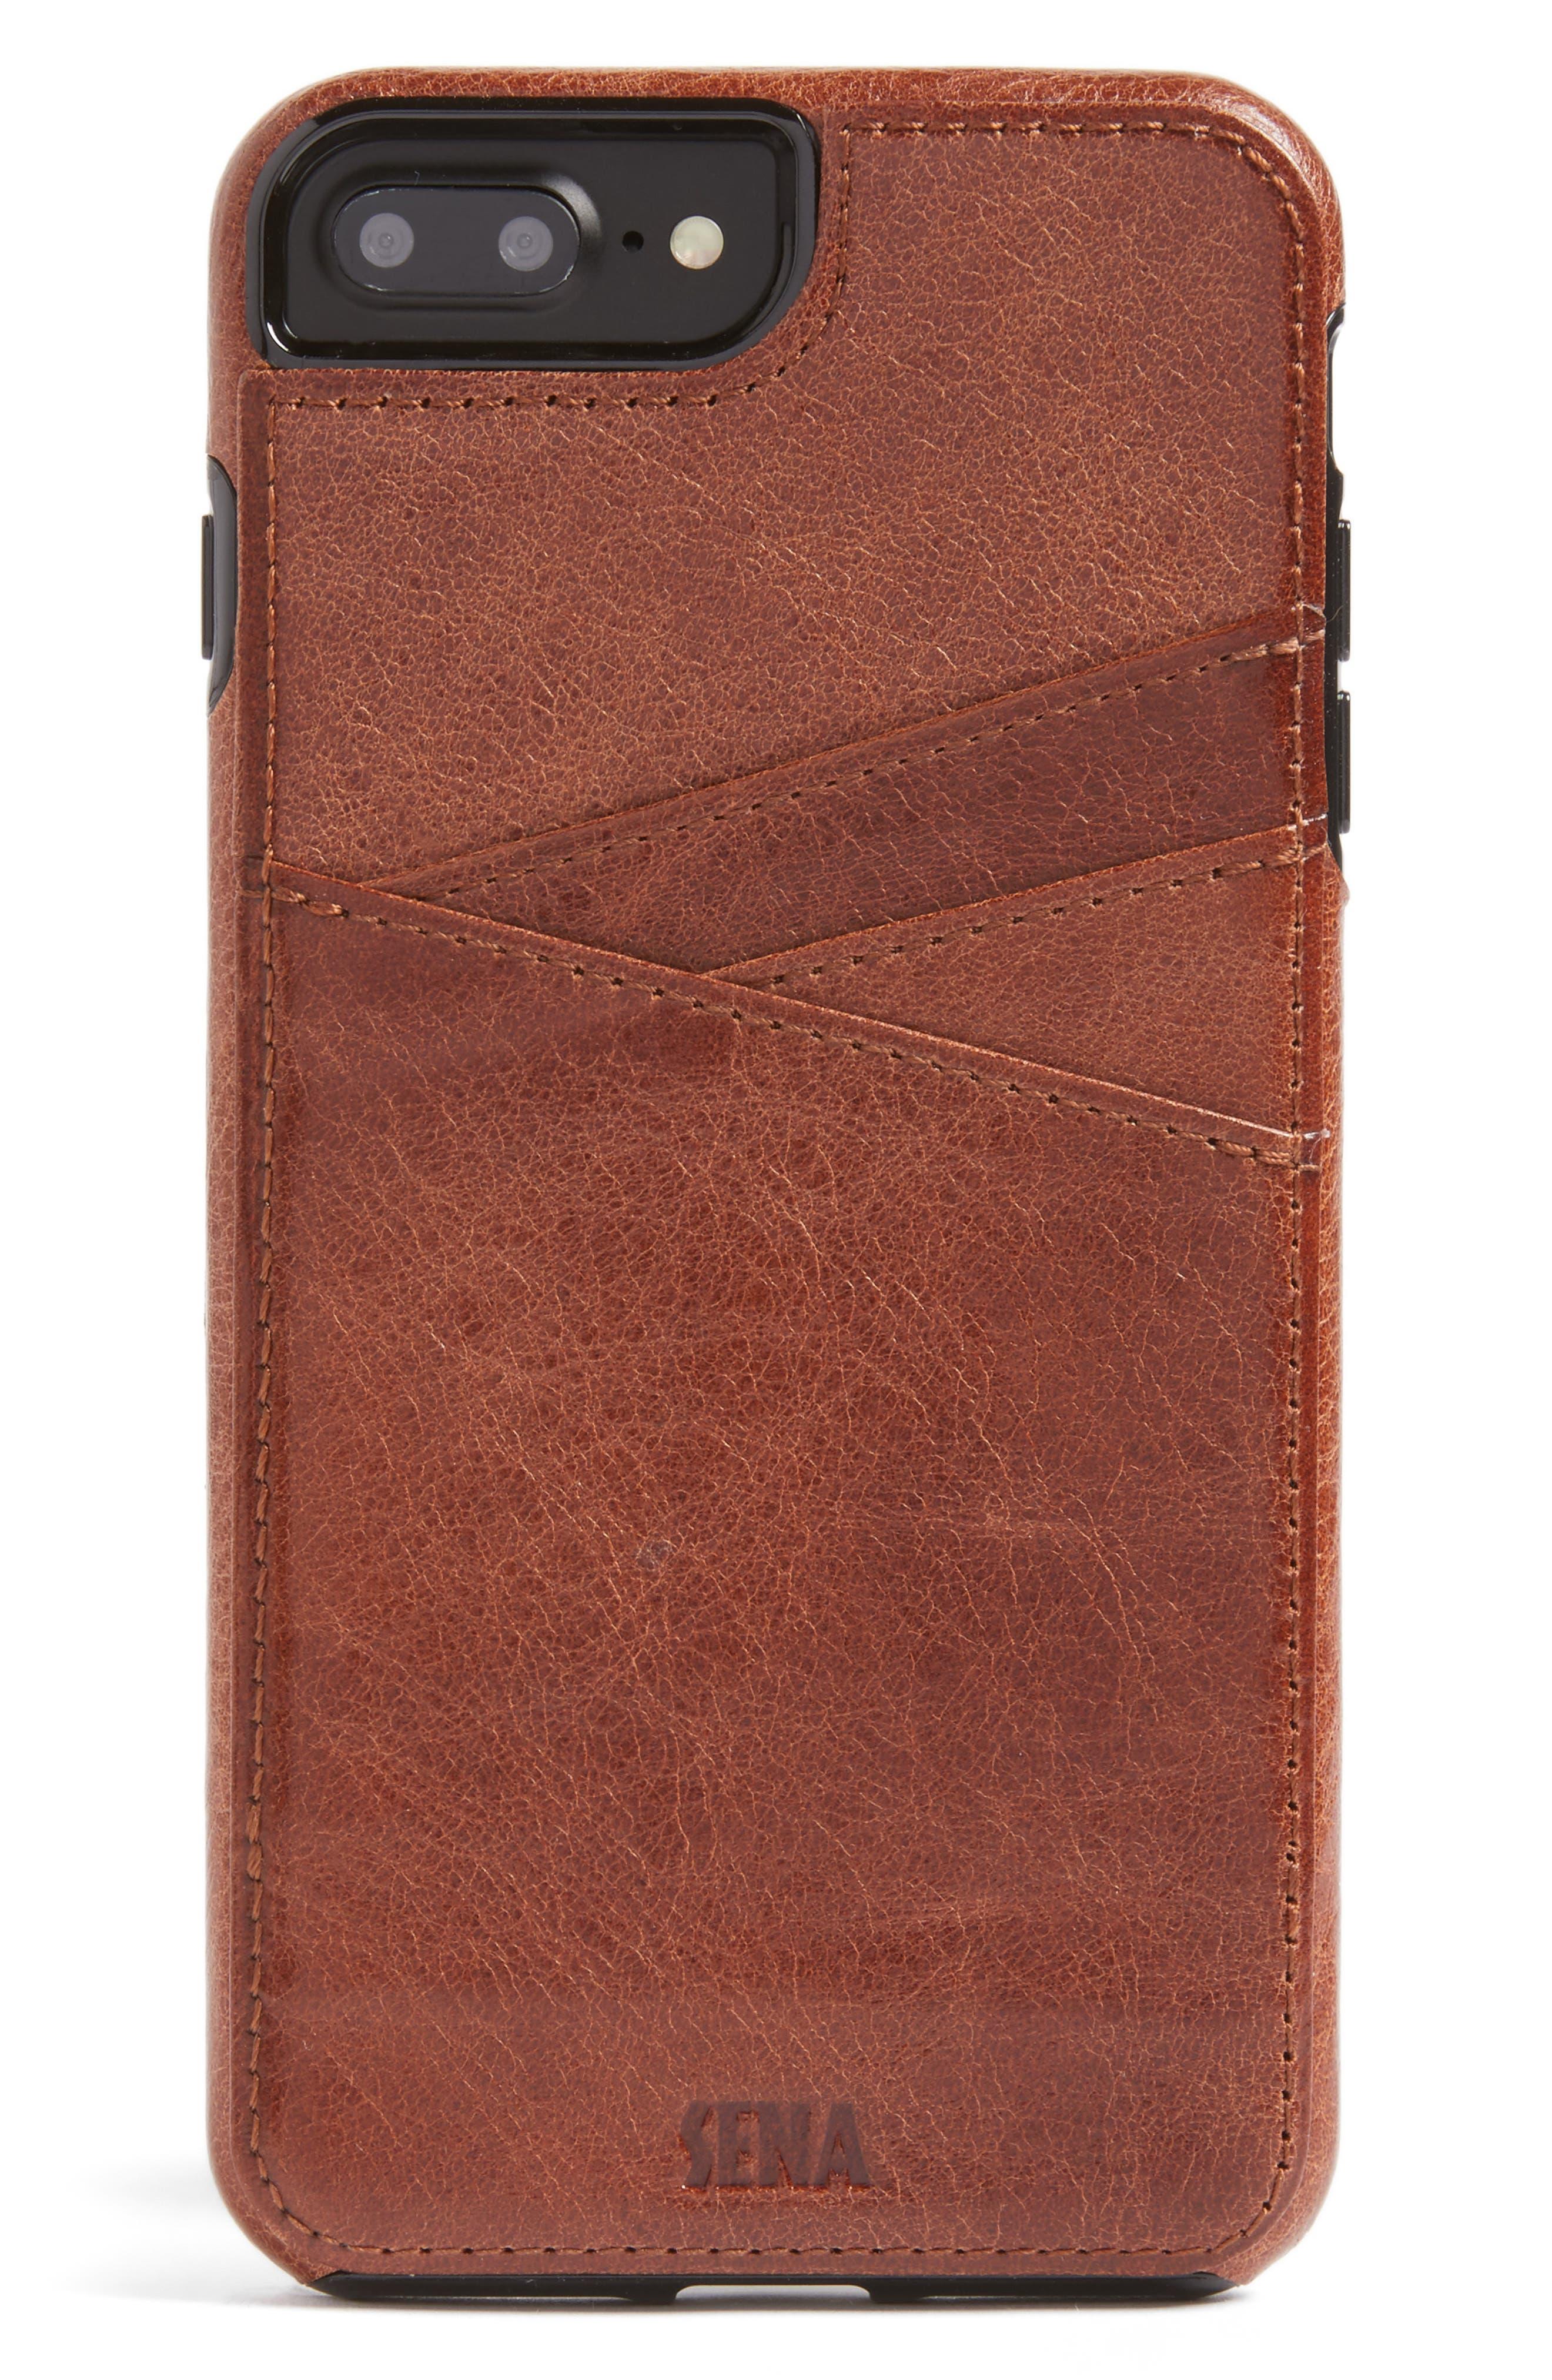 Sena Lugano iPhone 7 Plus Wallet Case